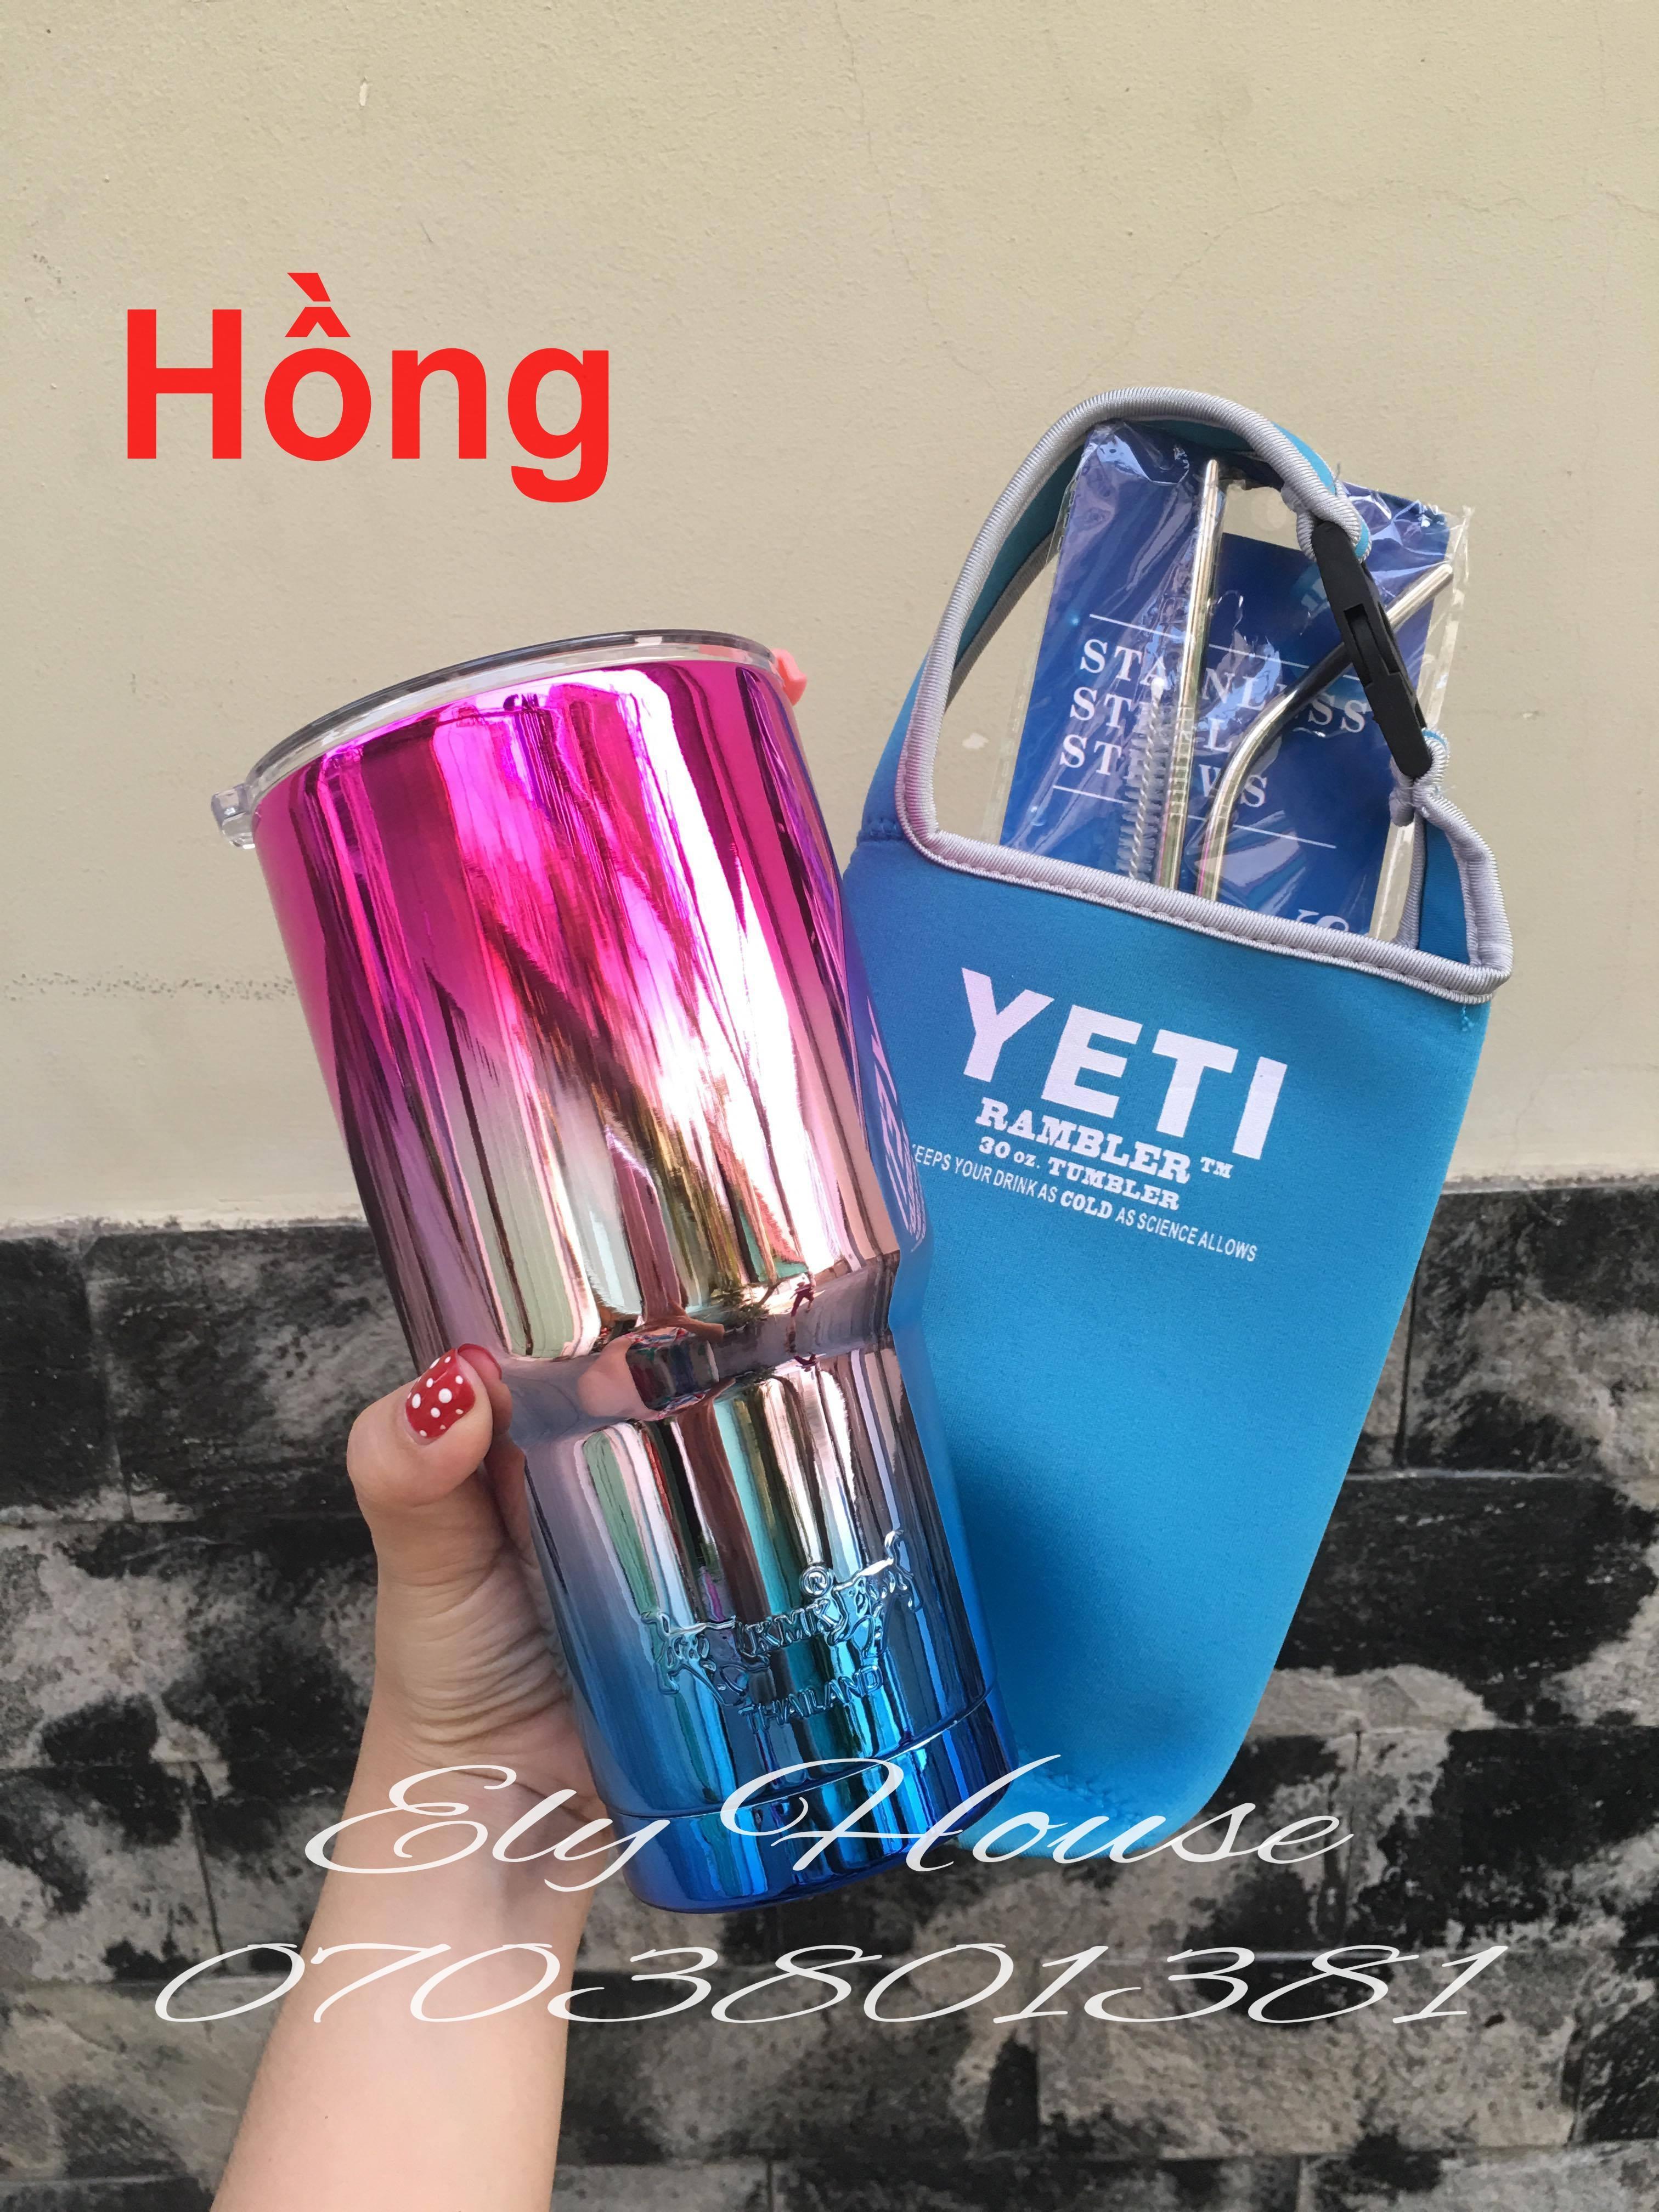 LY GIỮ NHIỆT THAILAND (Combo Ly+túi+ốnghút)